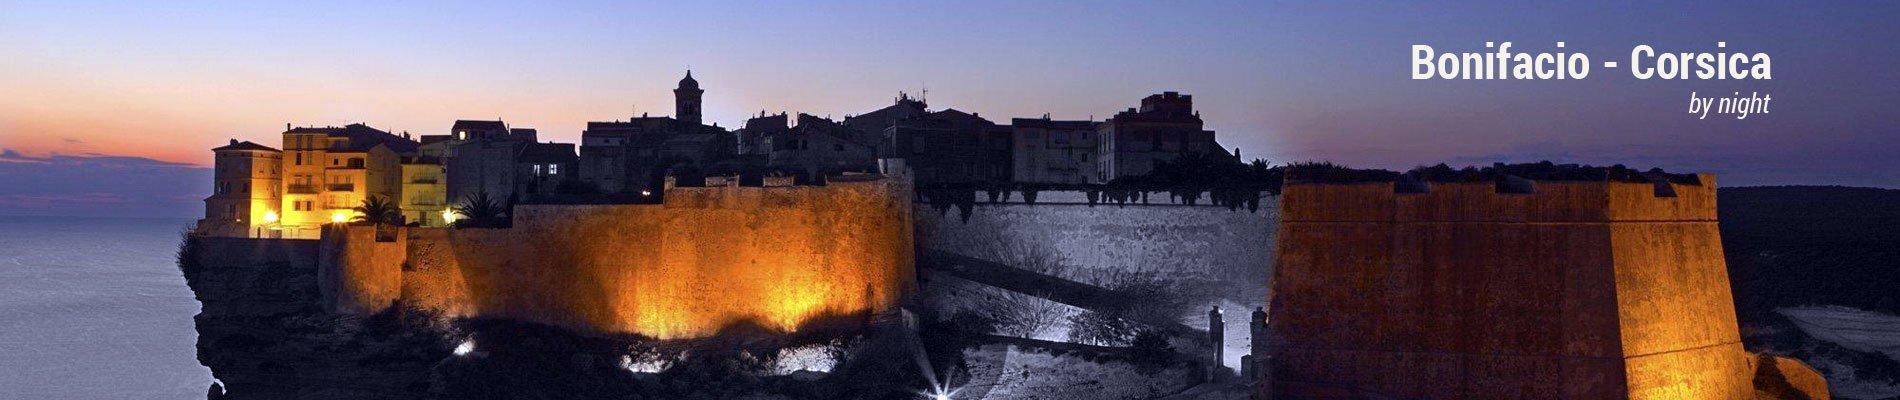 bonifacio by night banner corsica